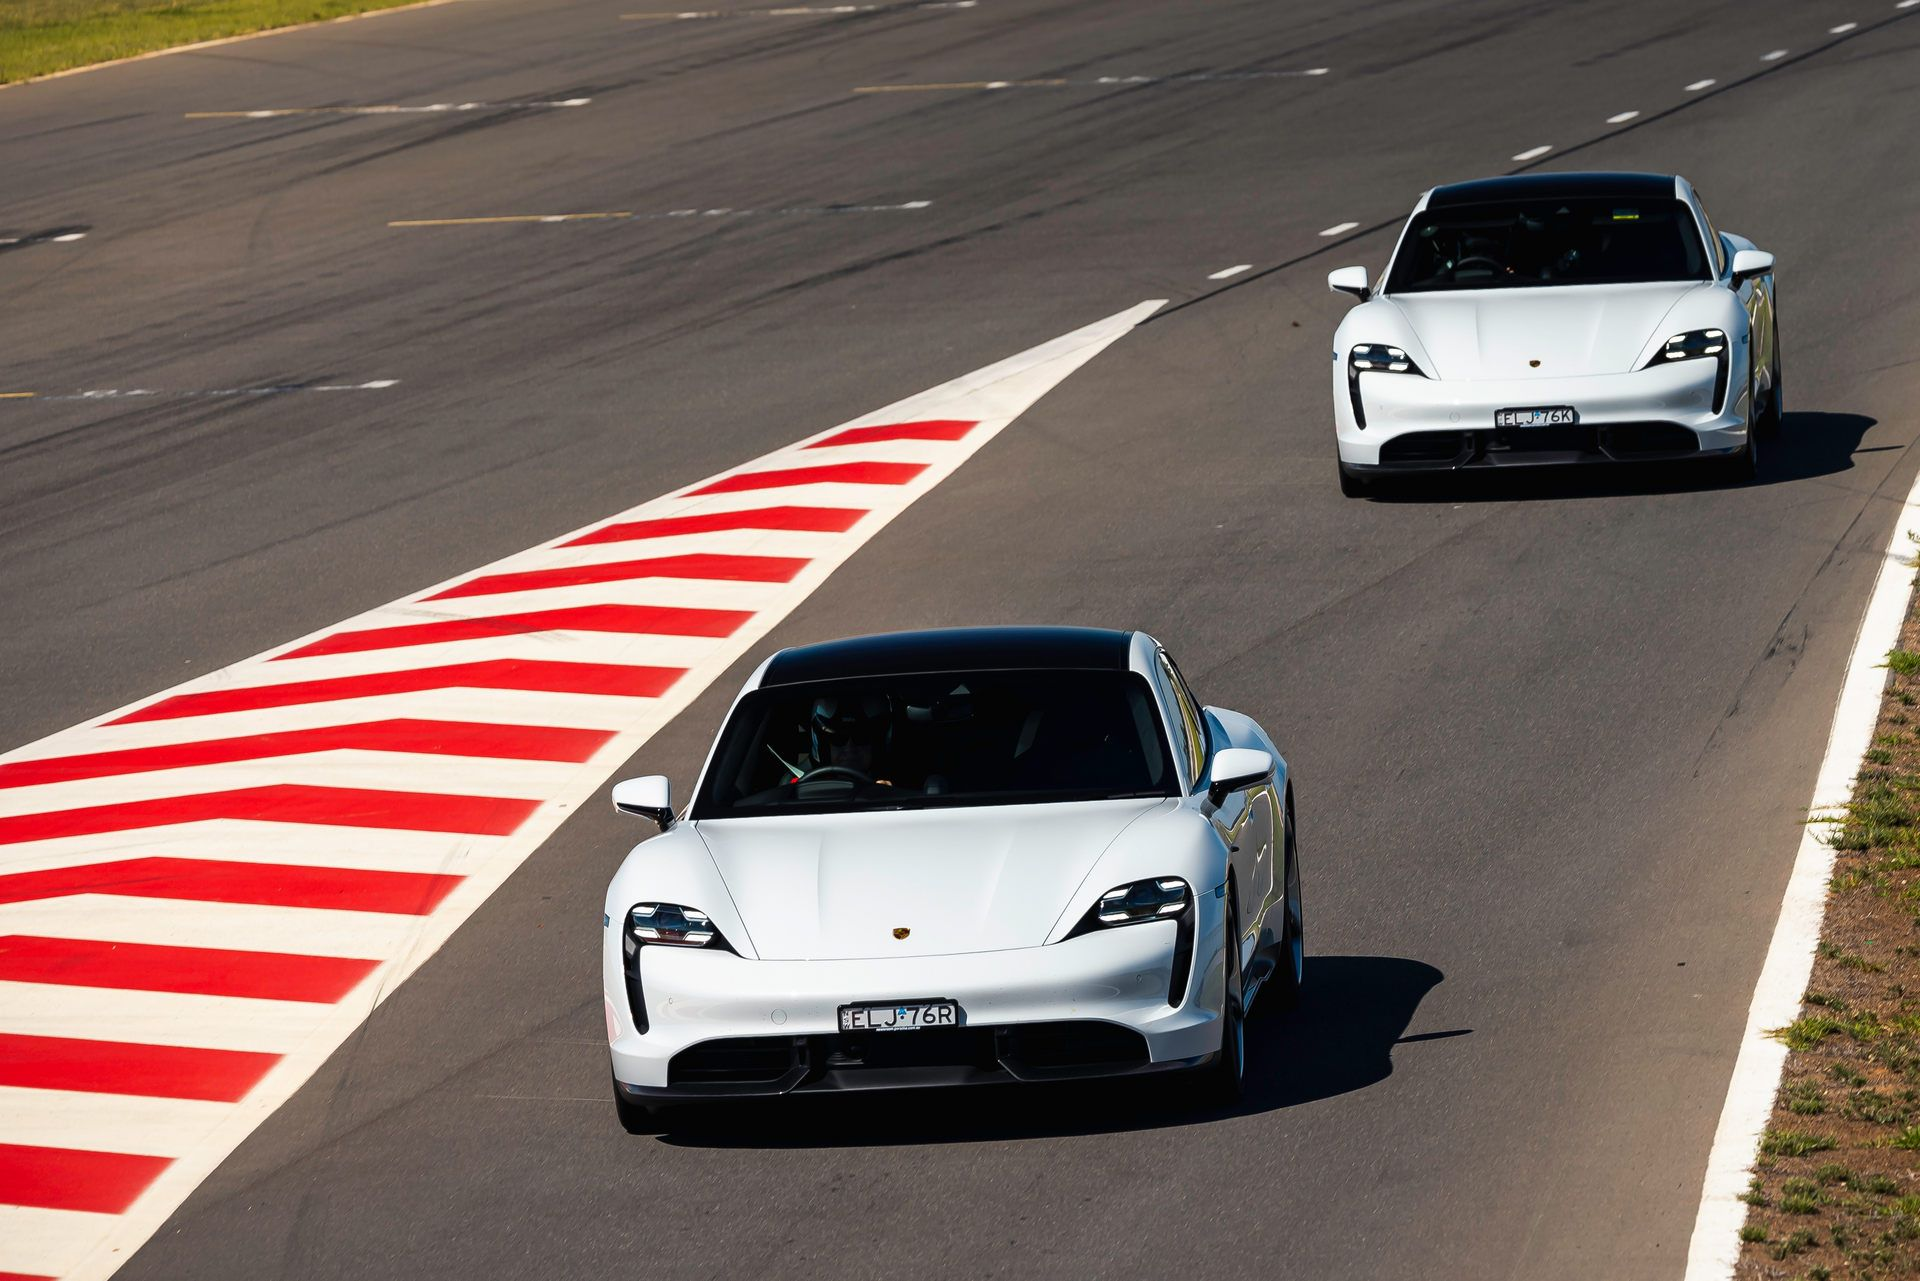 Porsche-Taycan-Turbo-S-The-Bend-Motorsport-Park-2